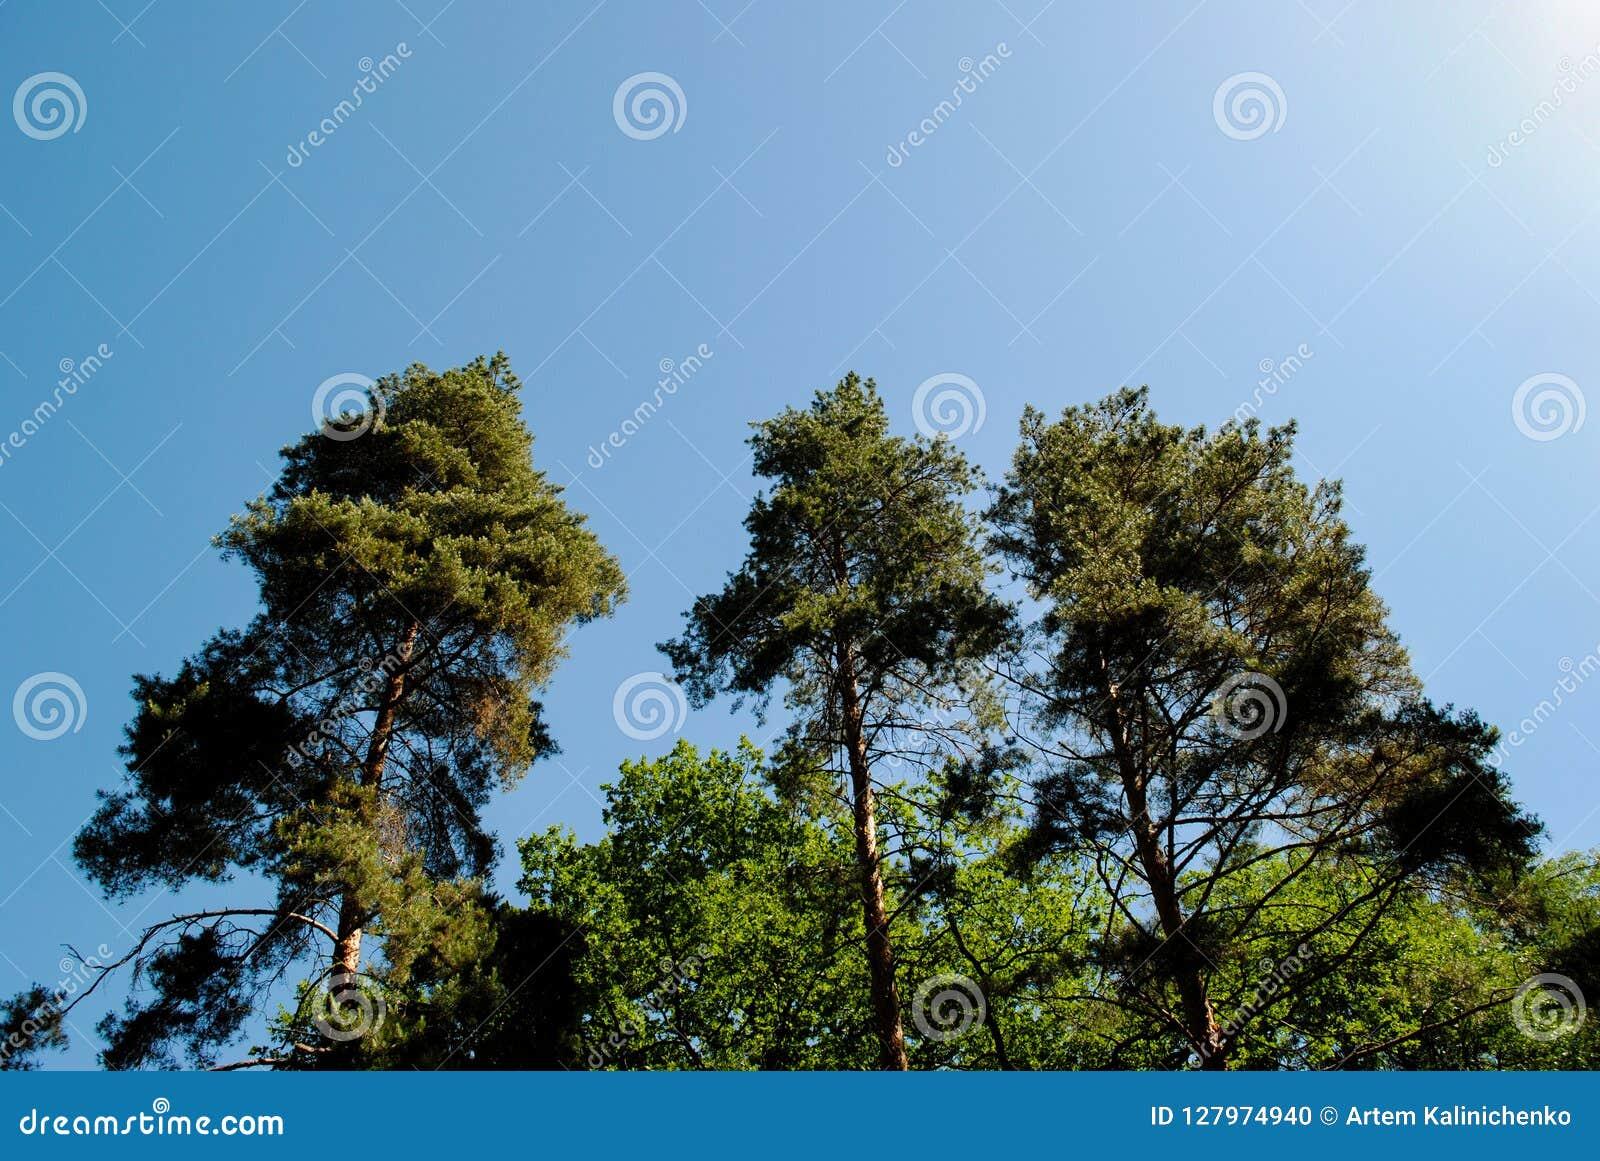 Beautiful green arboretum in the park Sofiyivka